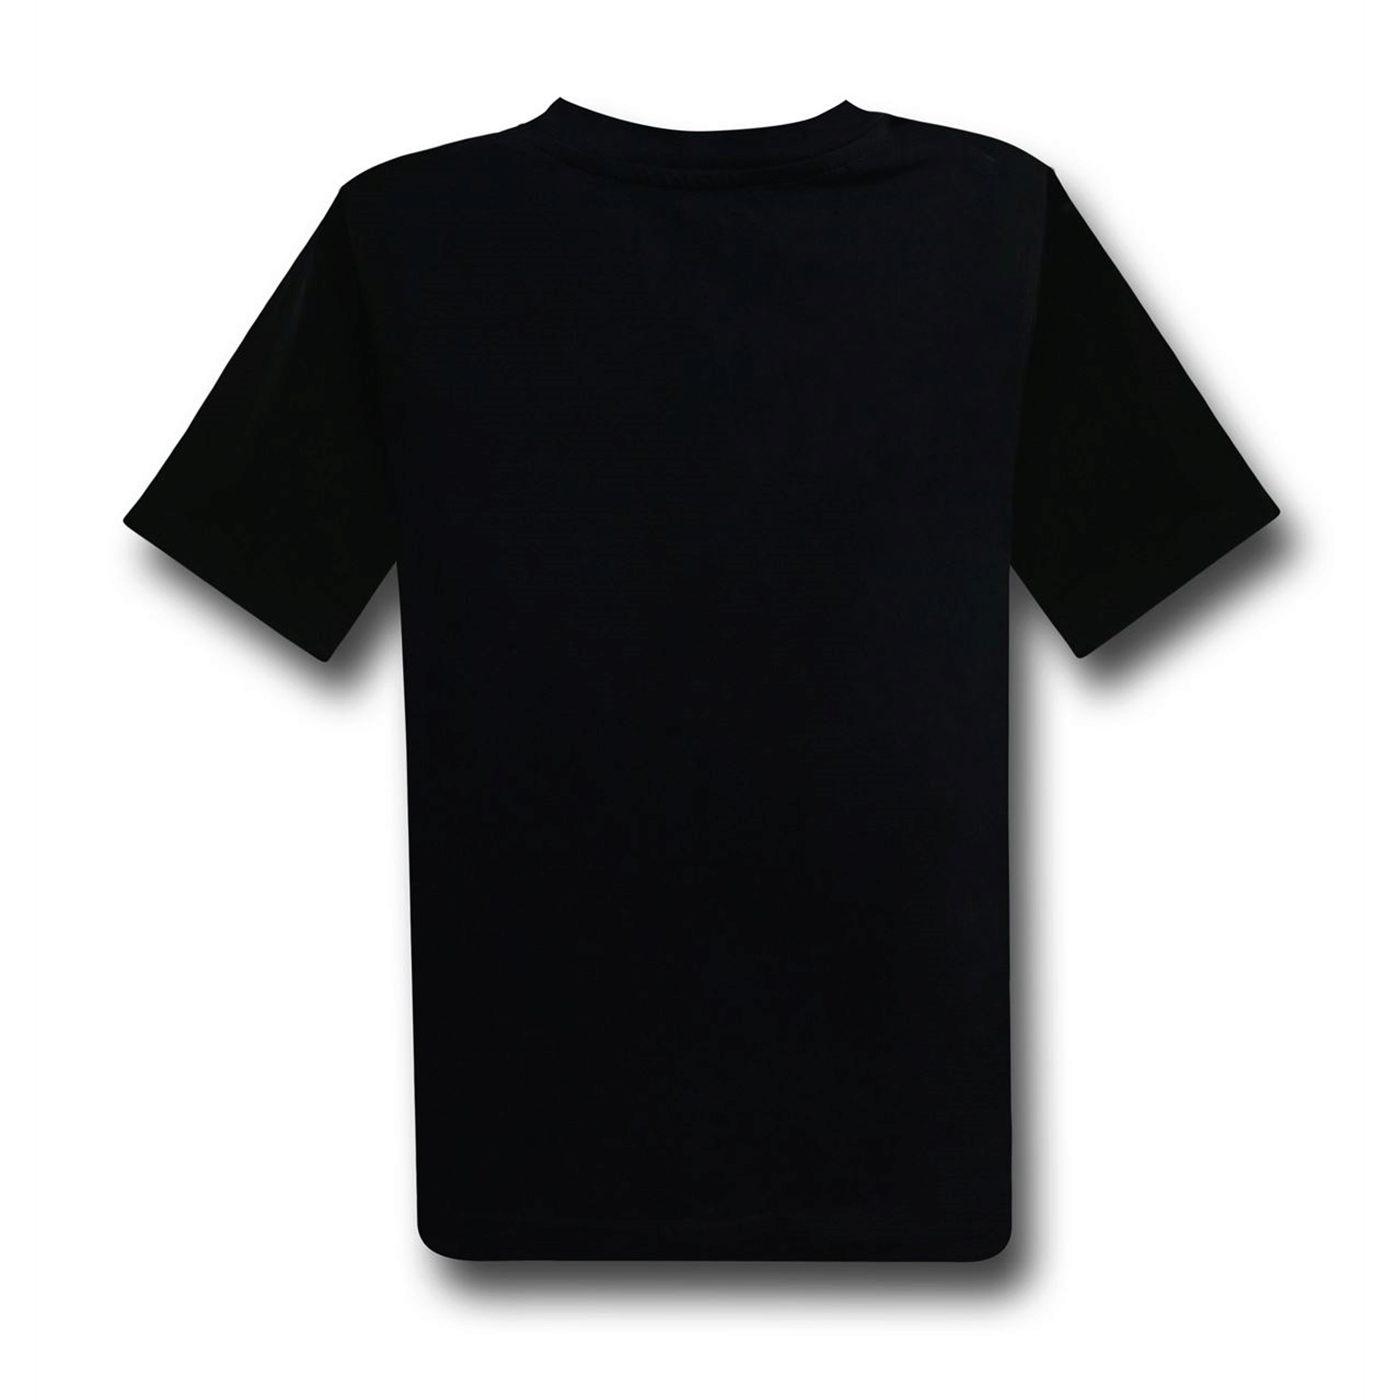 Batman V Superman Battle Kids Cut & Sew Image T-Shirt